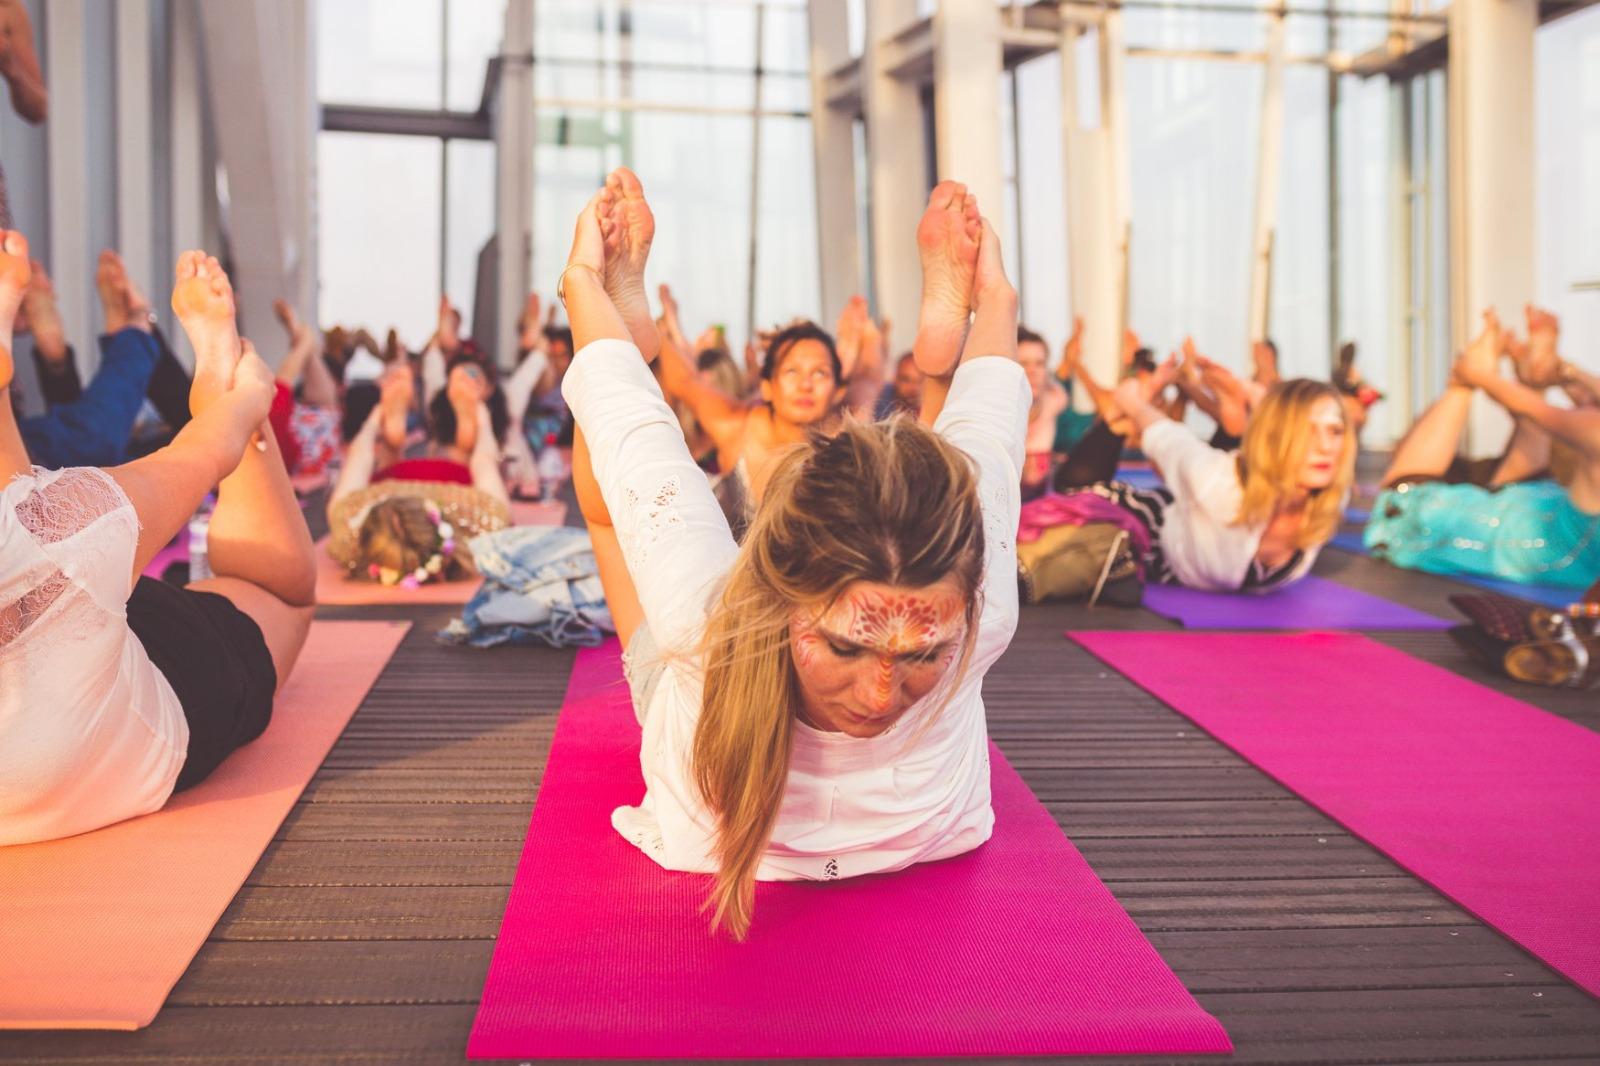 Morning Gloryville online Yoga